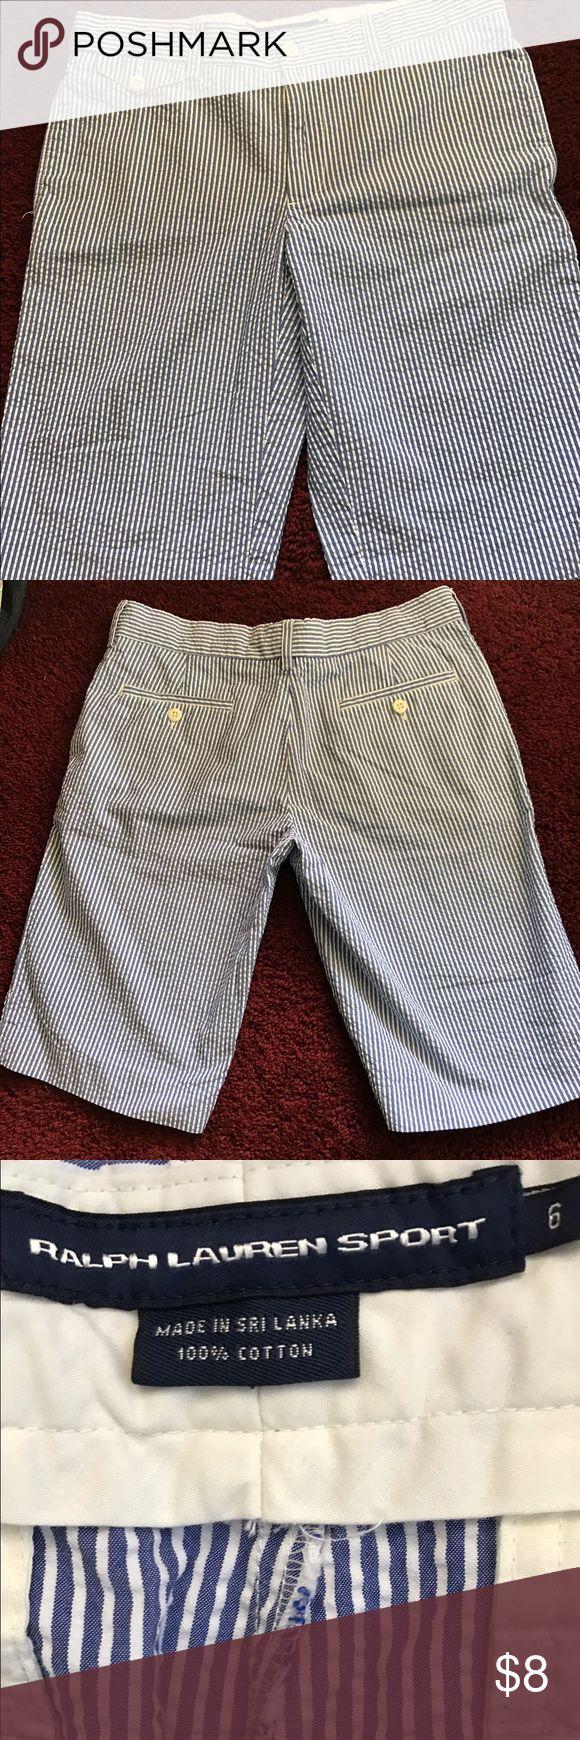 ⬇️Flash Sale⬇️🌸Ralph Lauren Bermuda shorts Women's Ralph Lauren sport Bermuda shorts! Make me an offer! ralph lauren sport Shorts Bermudas